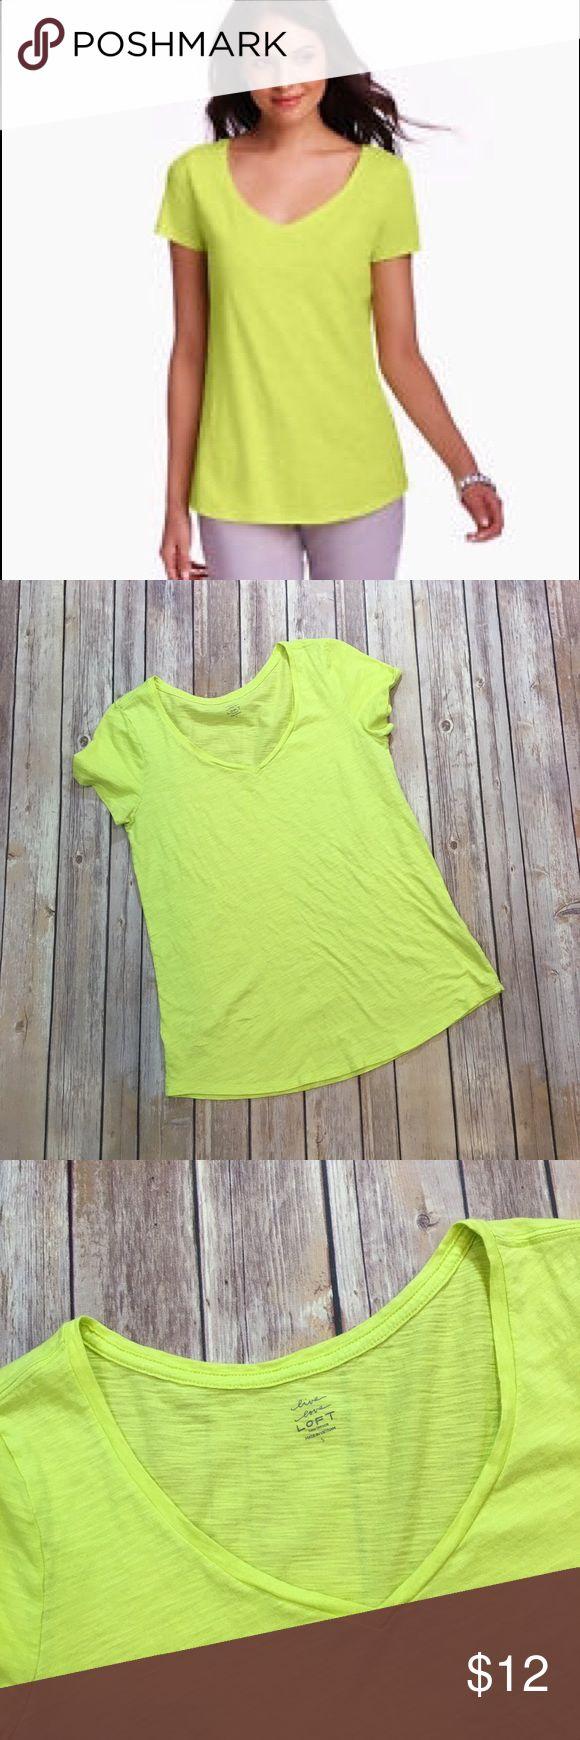 "LOFT Neon Yellow V Neck Tee LOFT Neon Yellow Cotton Tee. Measures pit to pit 18""/ length 26""/ sleeve length 6.5"" LOFT Tops Tees - Short Sleeve"